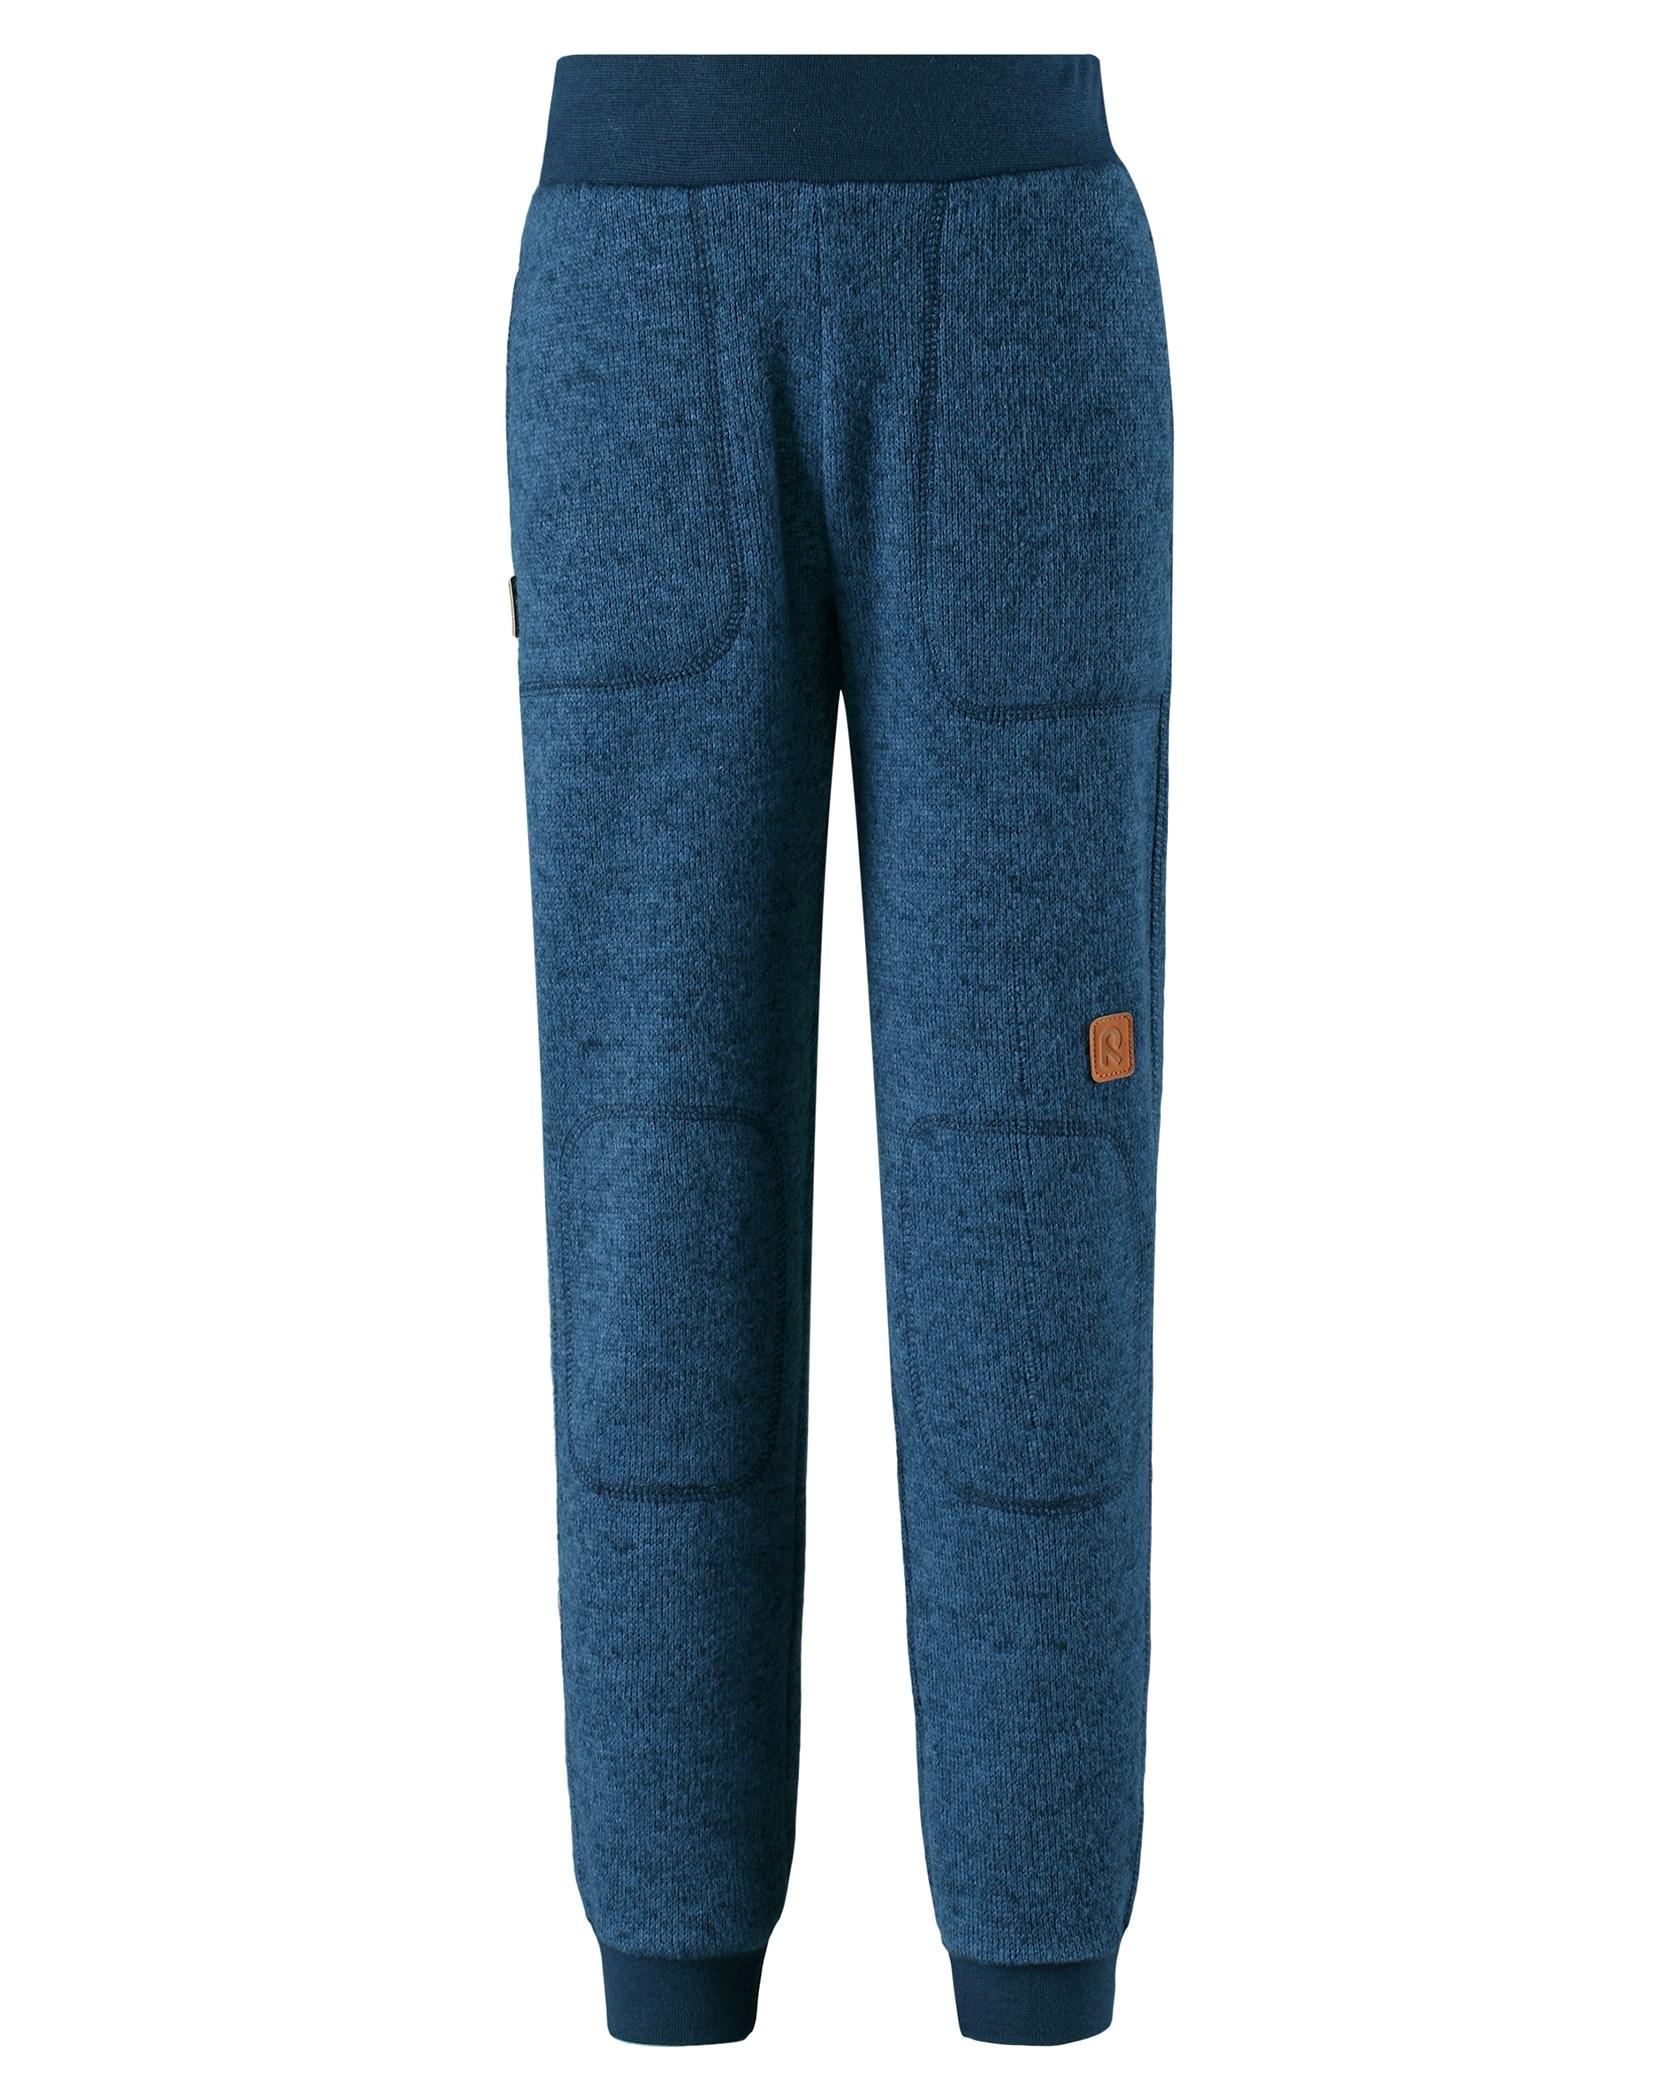 edea0add8 Fleece Pant Sangis JR Denim Blue